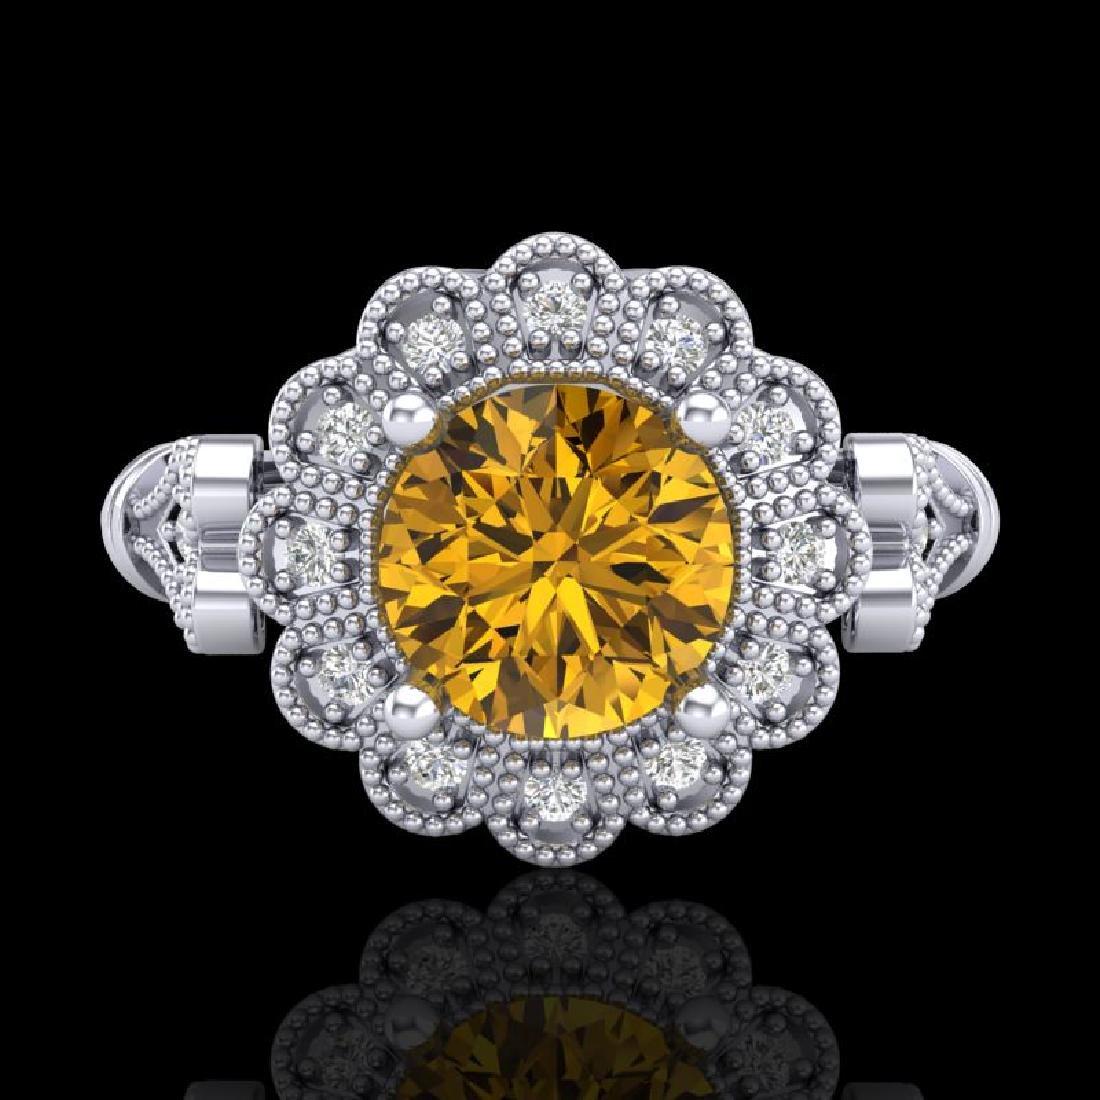 1.2 CTW Intense Fancy Yellow Diamond Engagement Art - 2